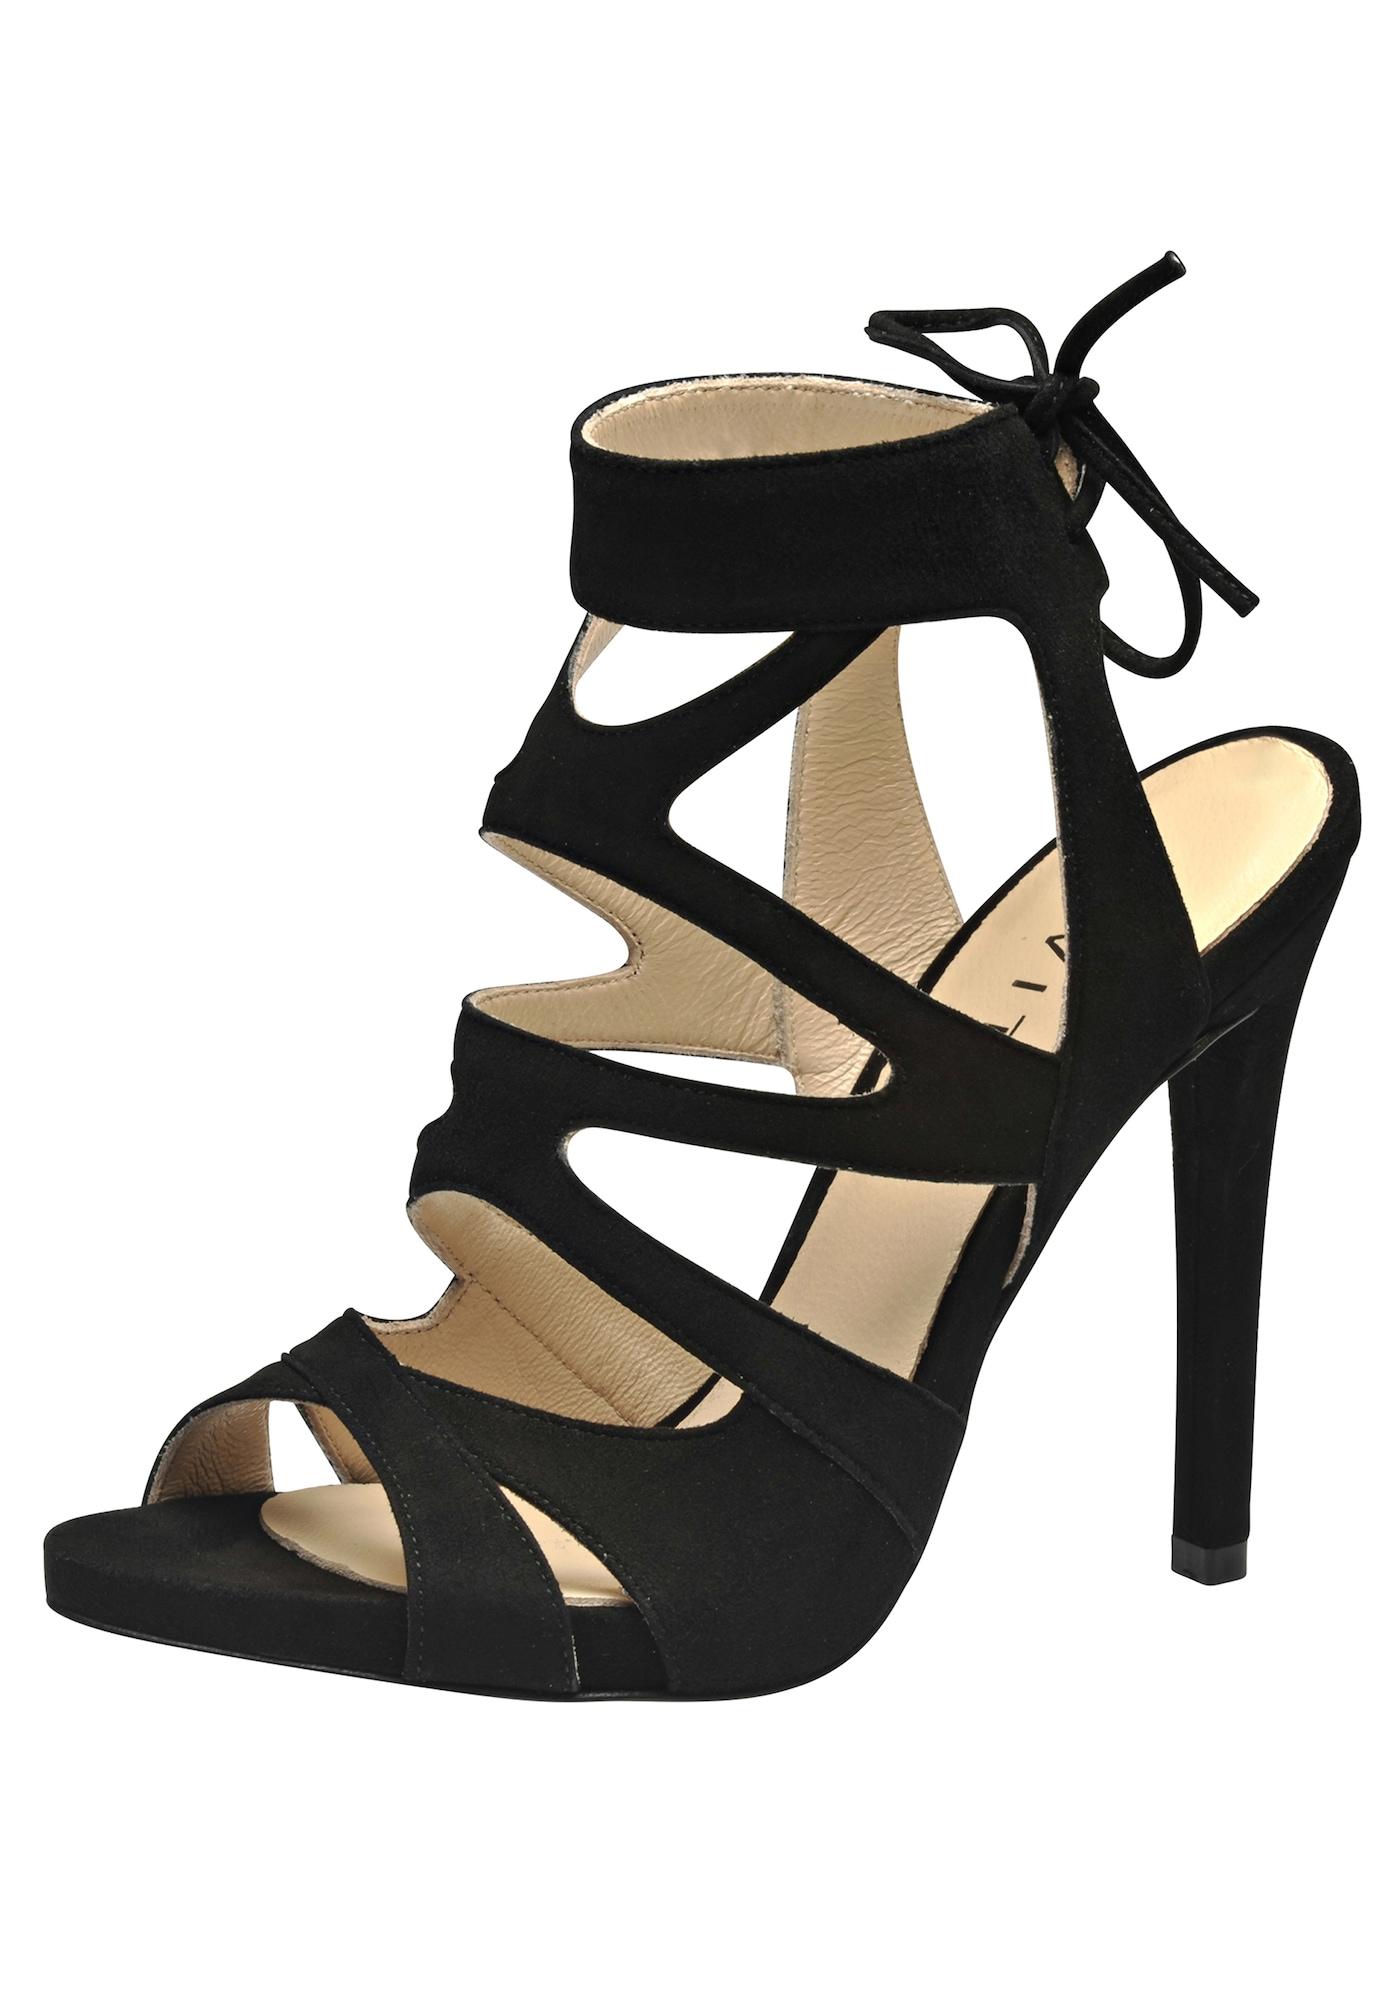 evita - Damen Sandalette